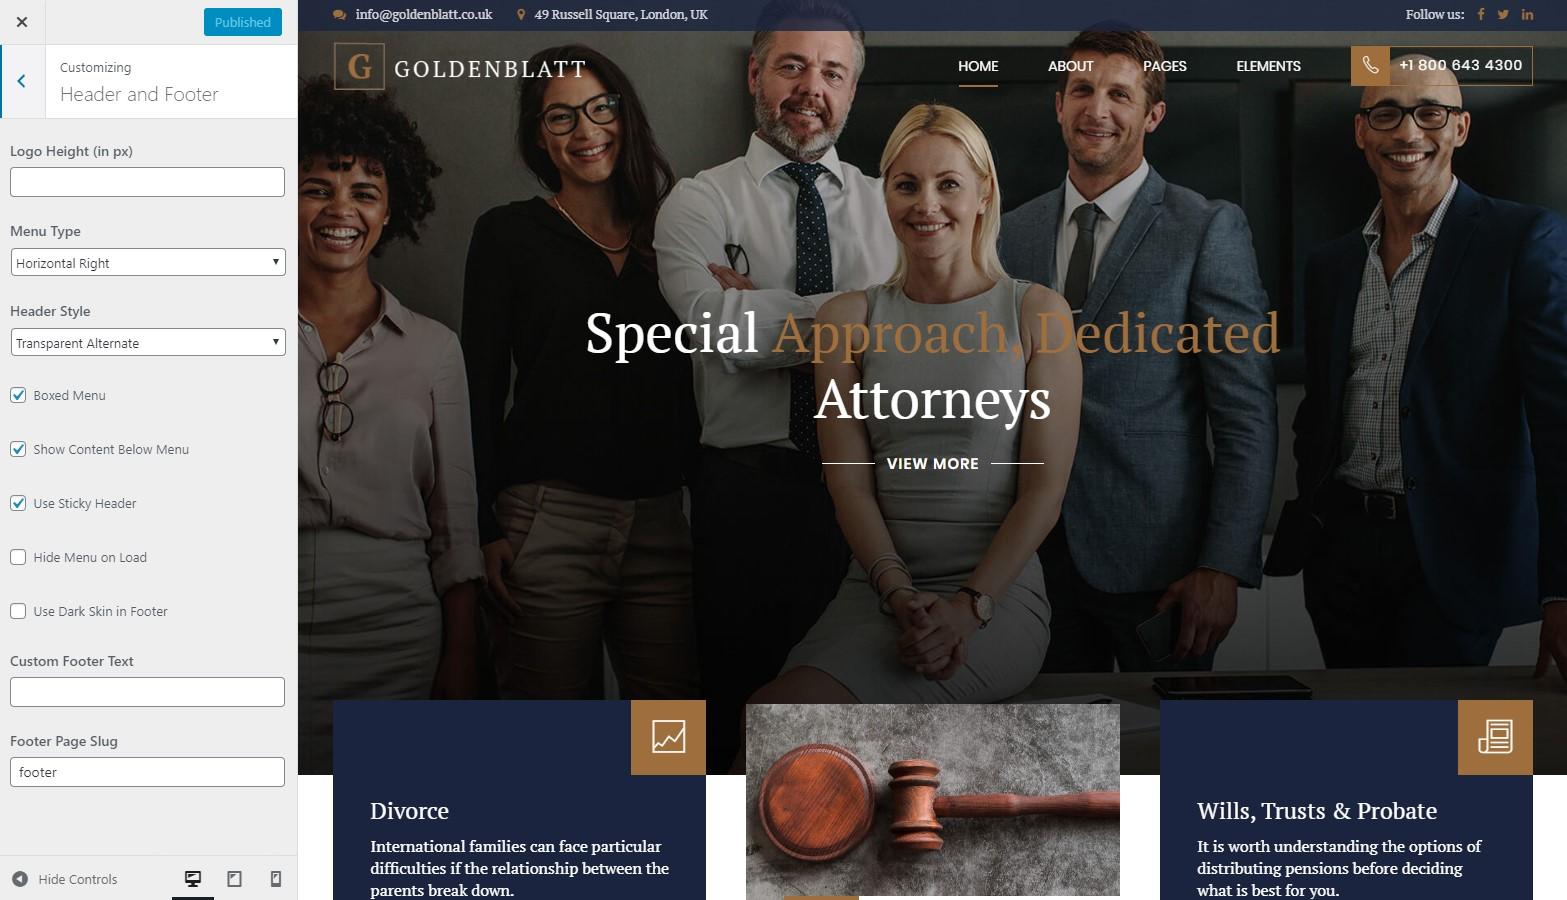 https://documentation.bold-themes.com/goldenblatt/wp-content/uploads/sites/51/2019/11/header-footer.jpg